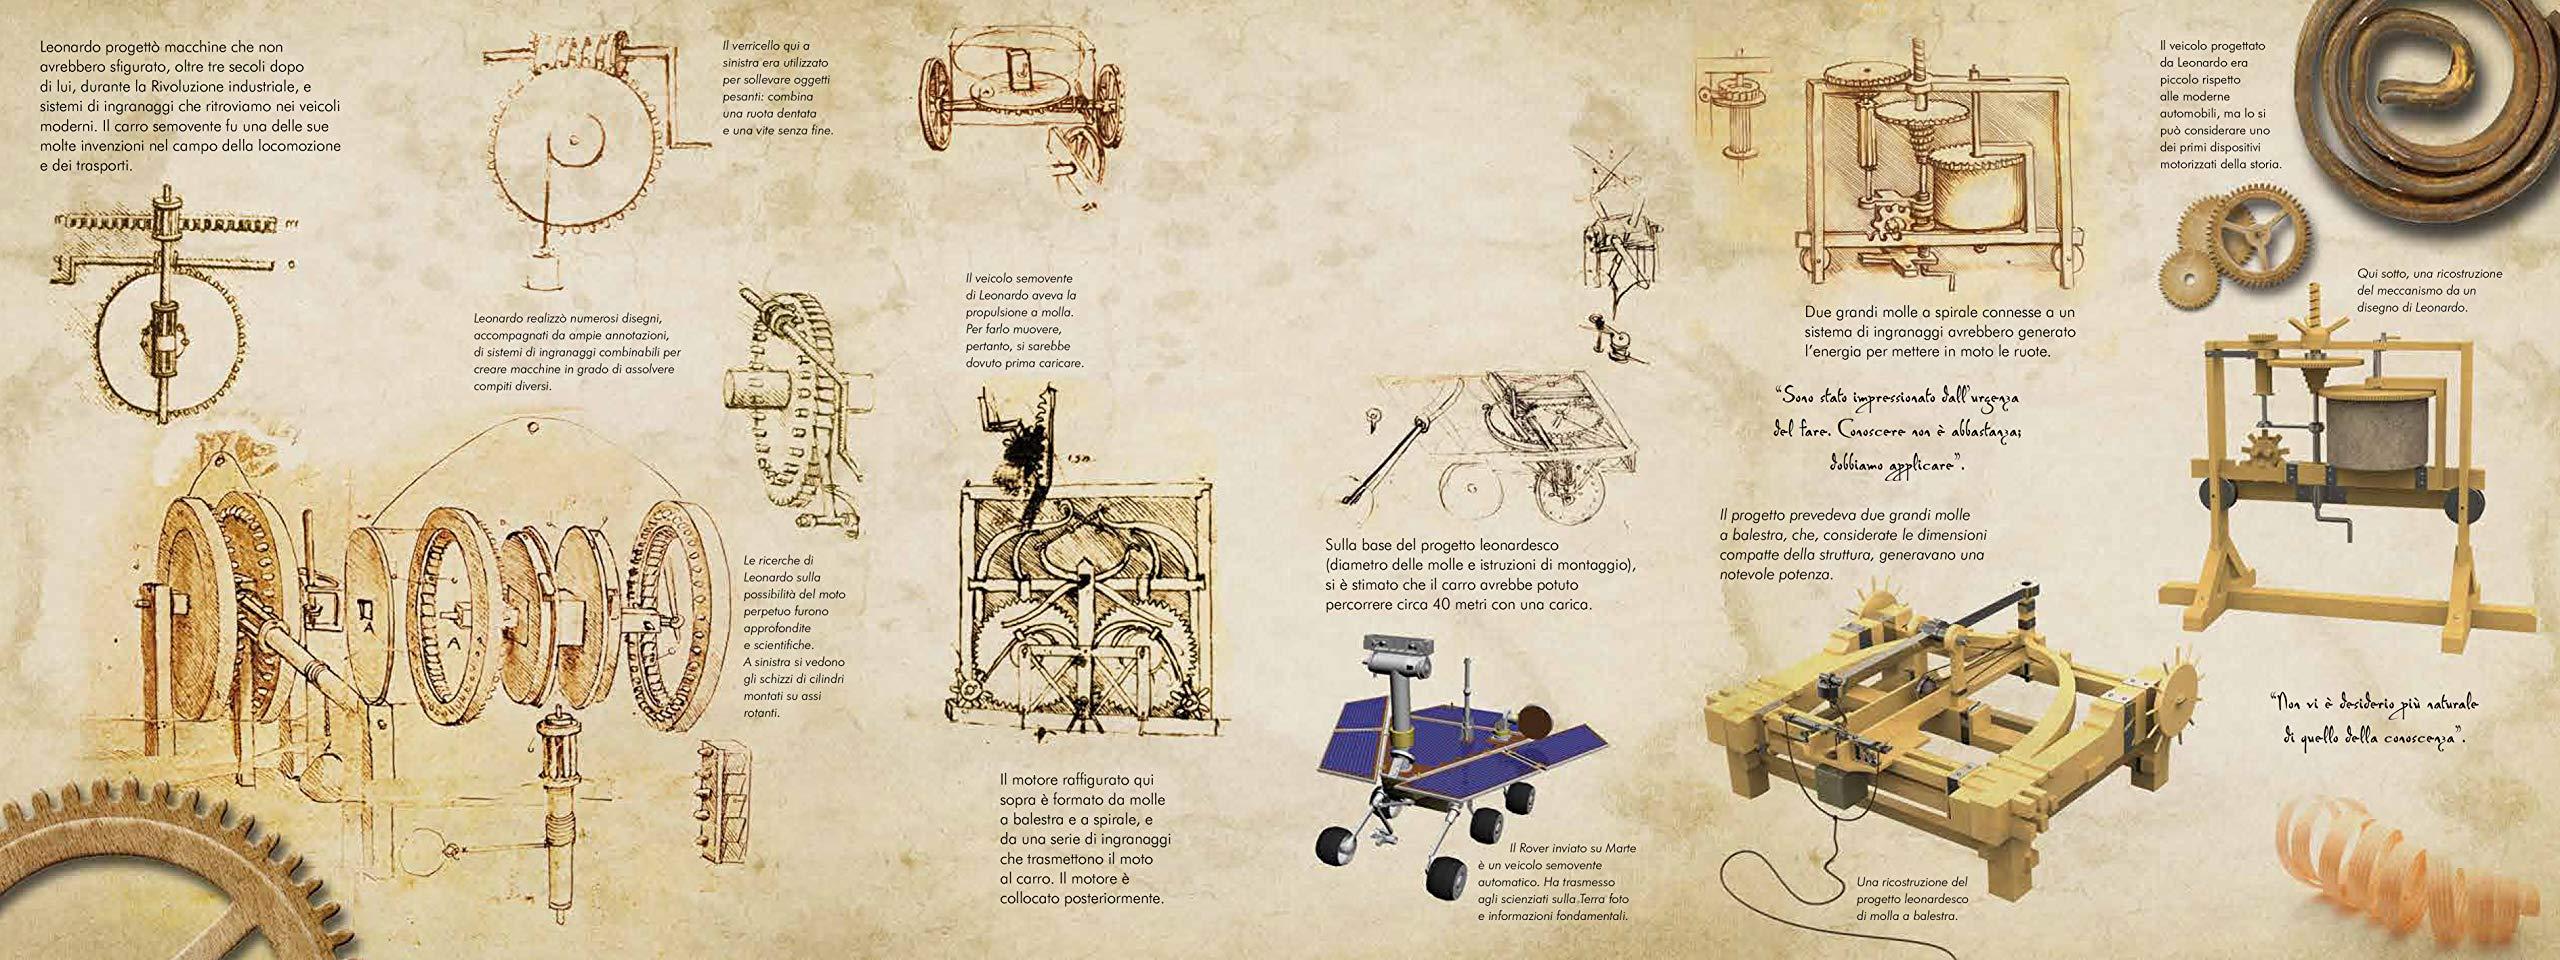 Vinci mécano